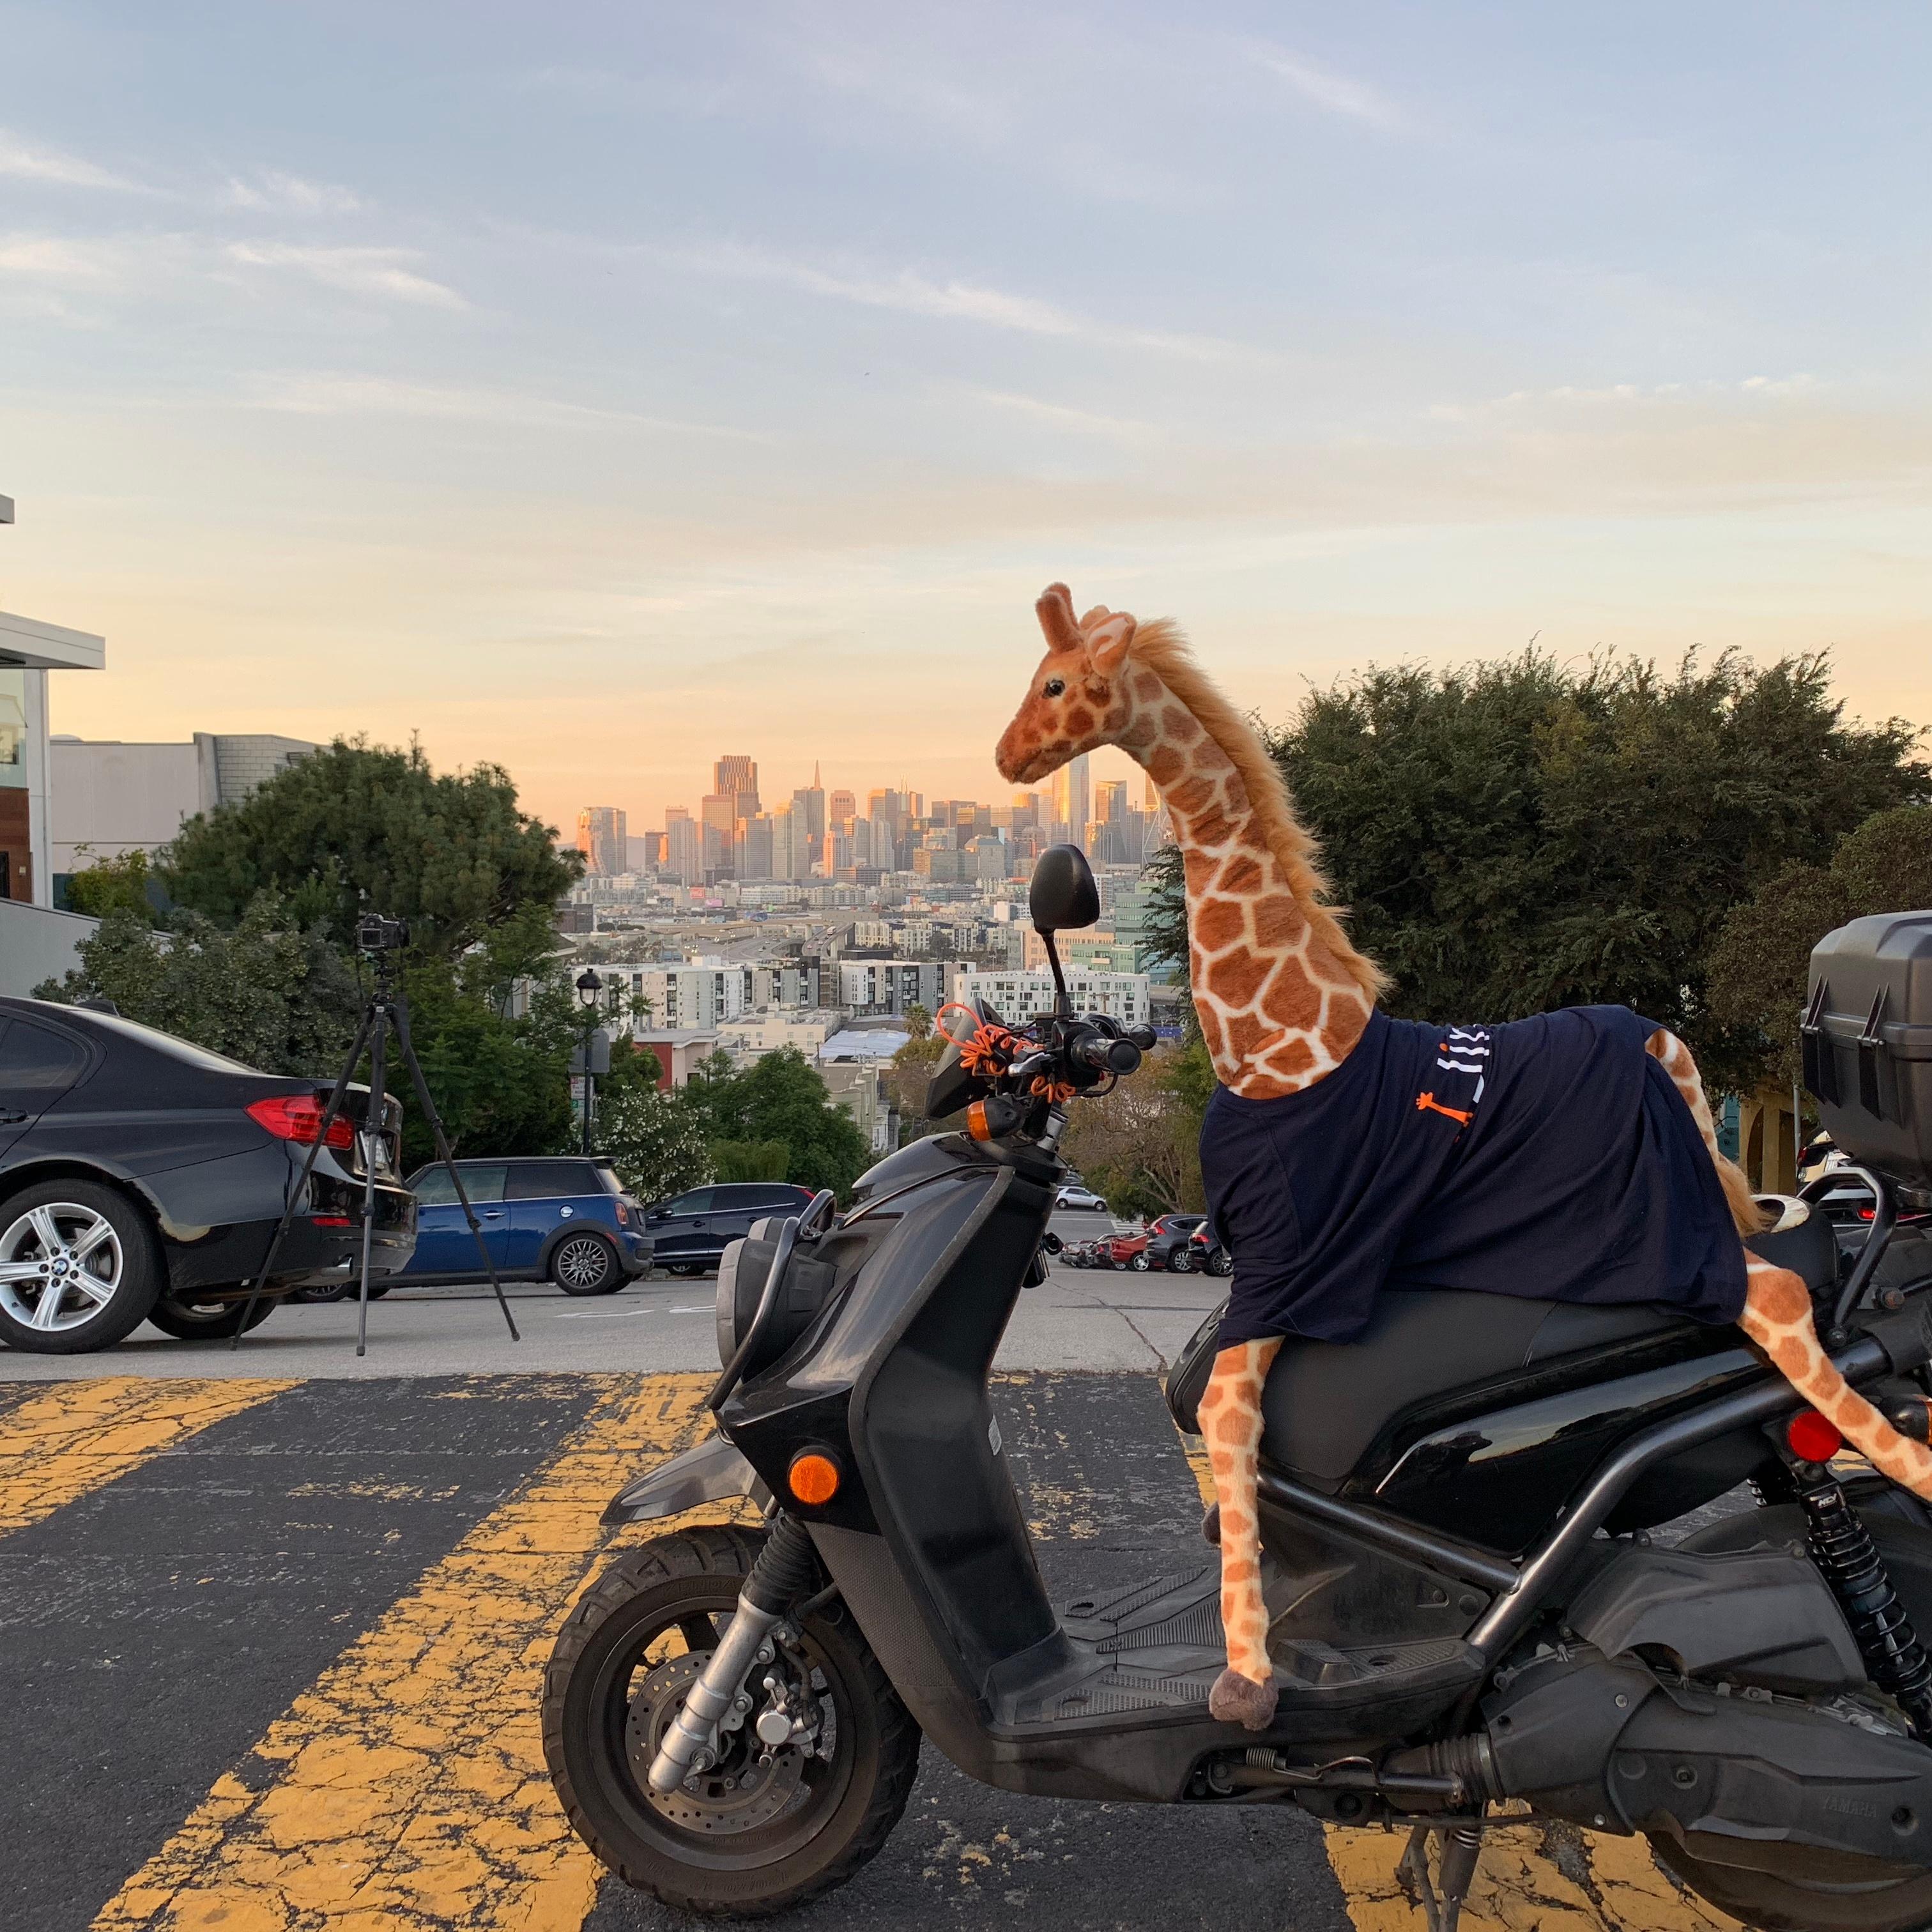 Jirav Scooter Pick pic